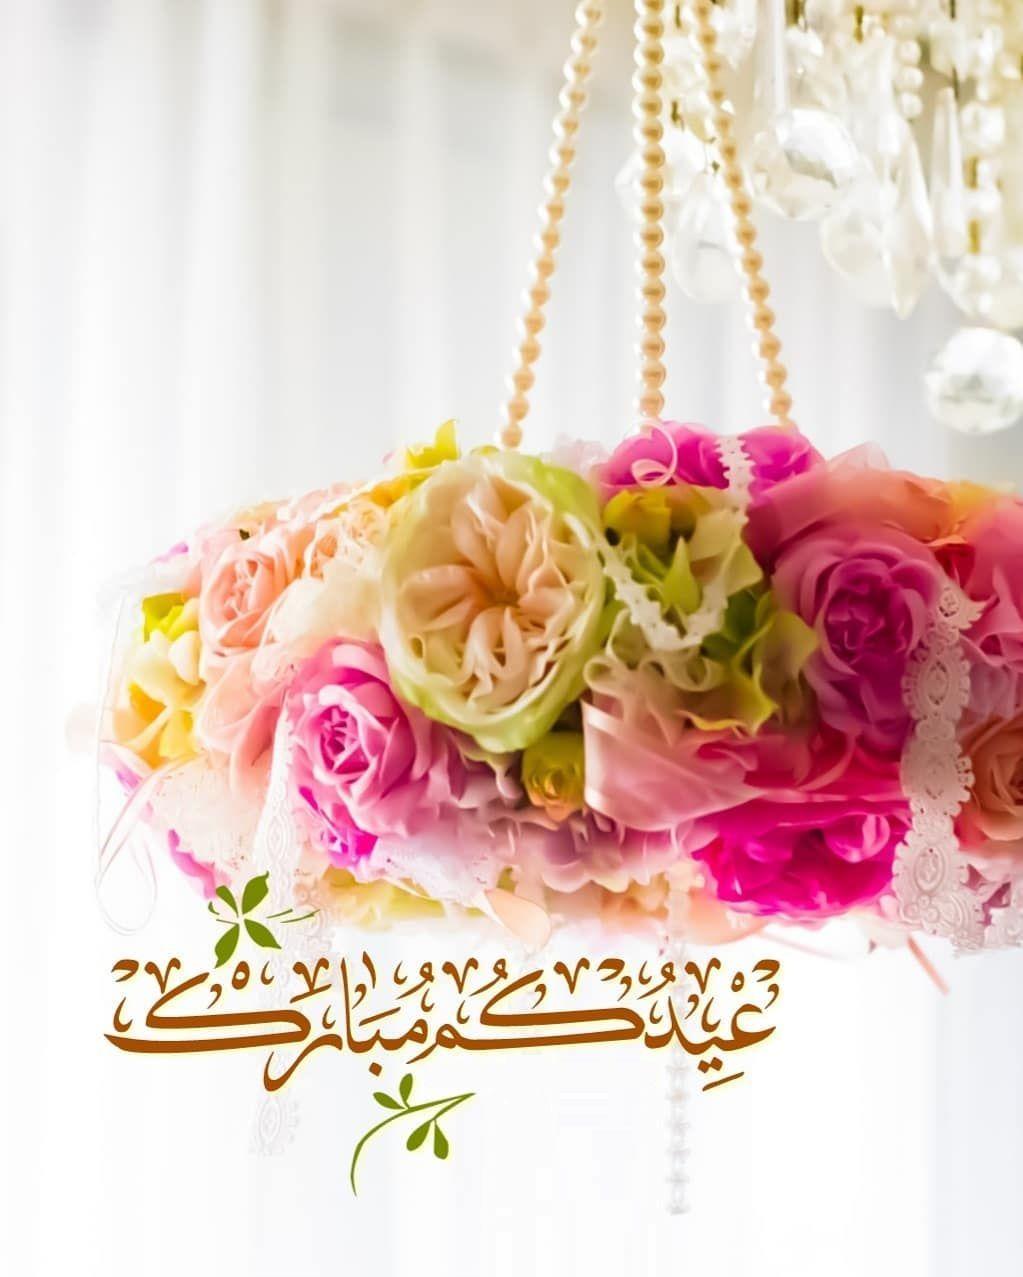 Pin By رغــــــد On عـيـد سعـيــد Eid Mubarak Eid Islamic Pictures